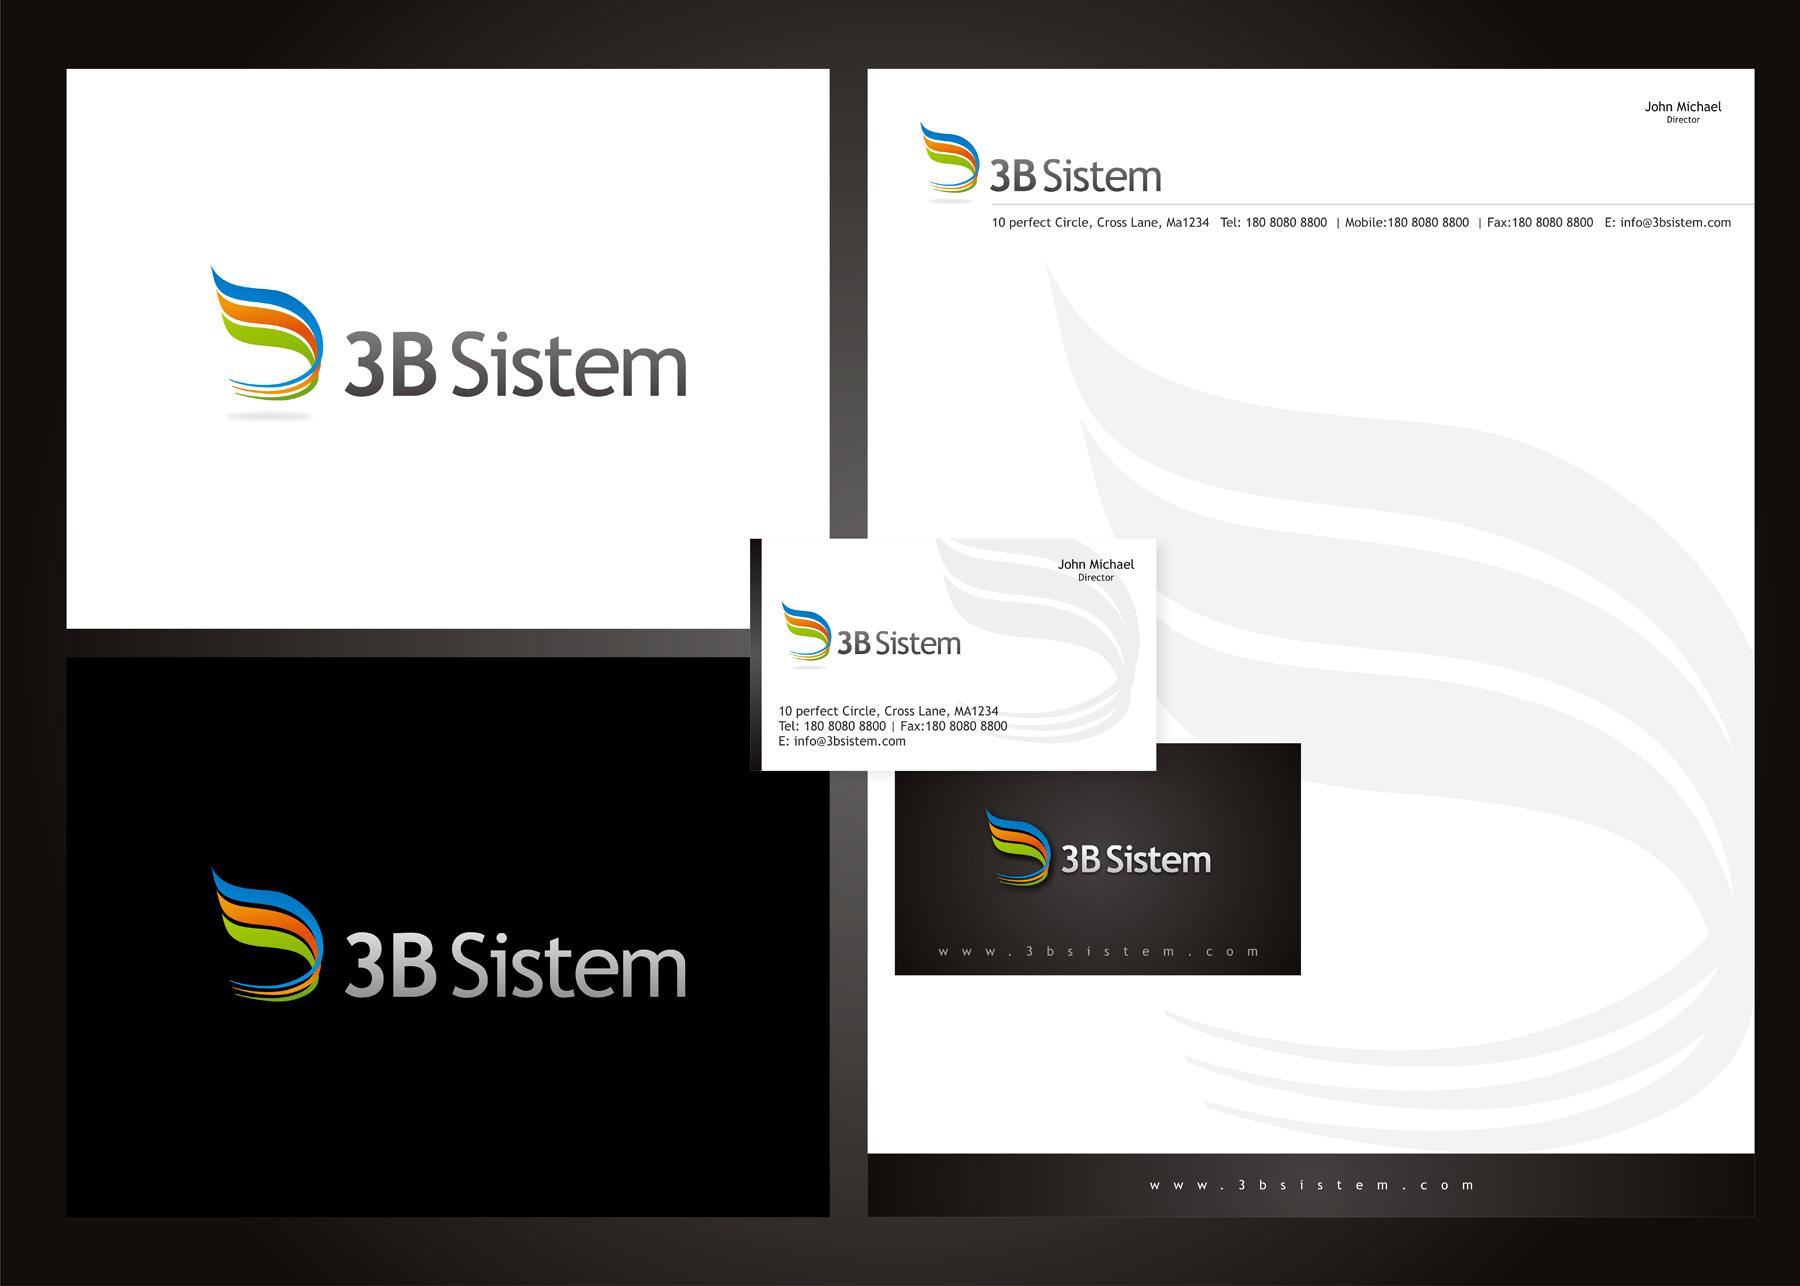 Create the next logo for 3B Sistem